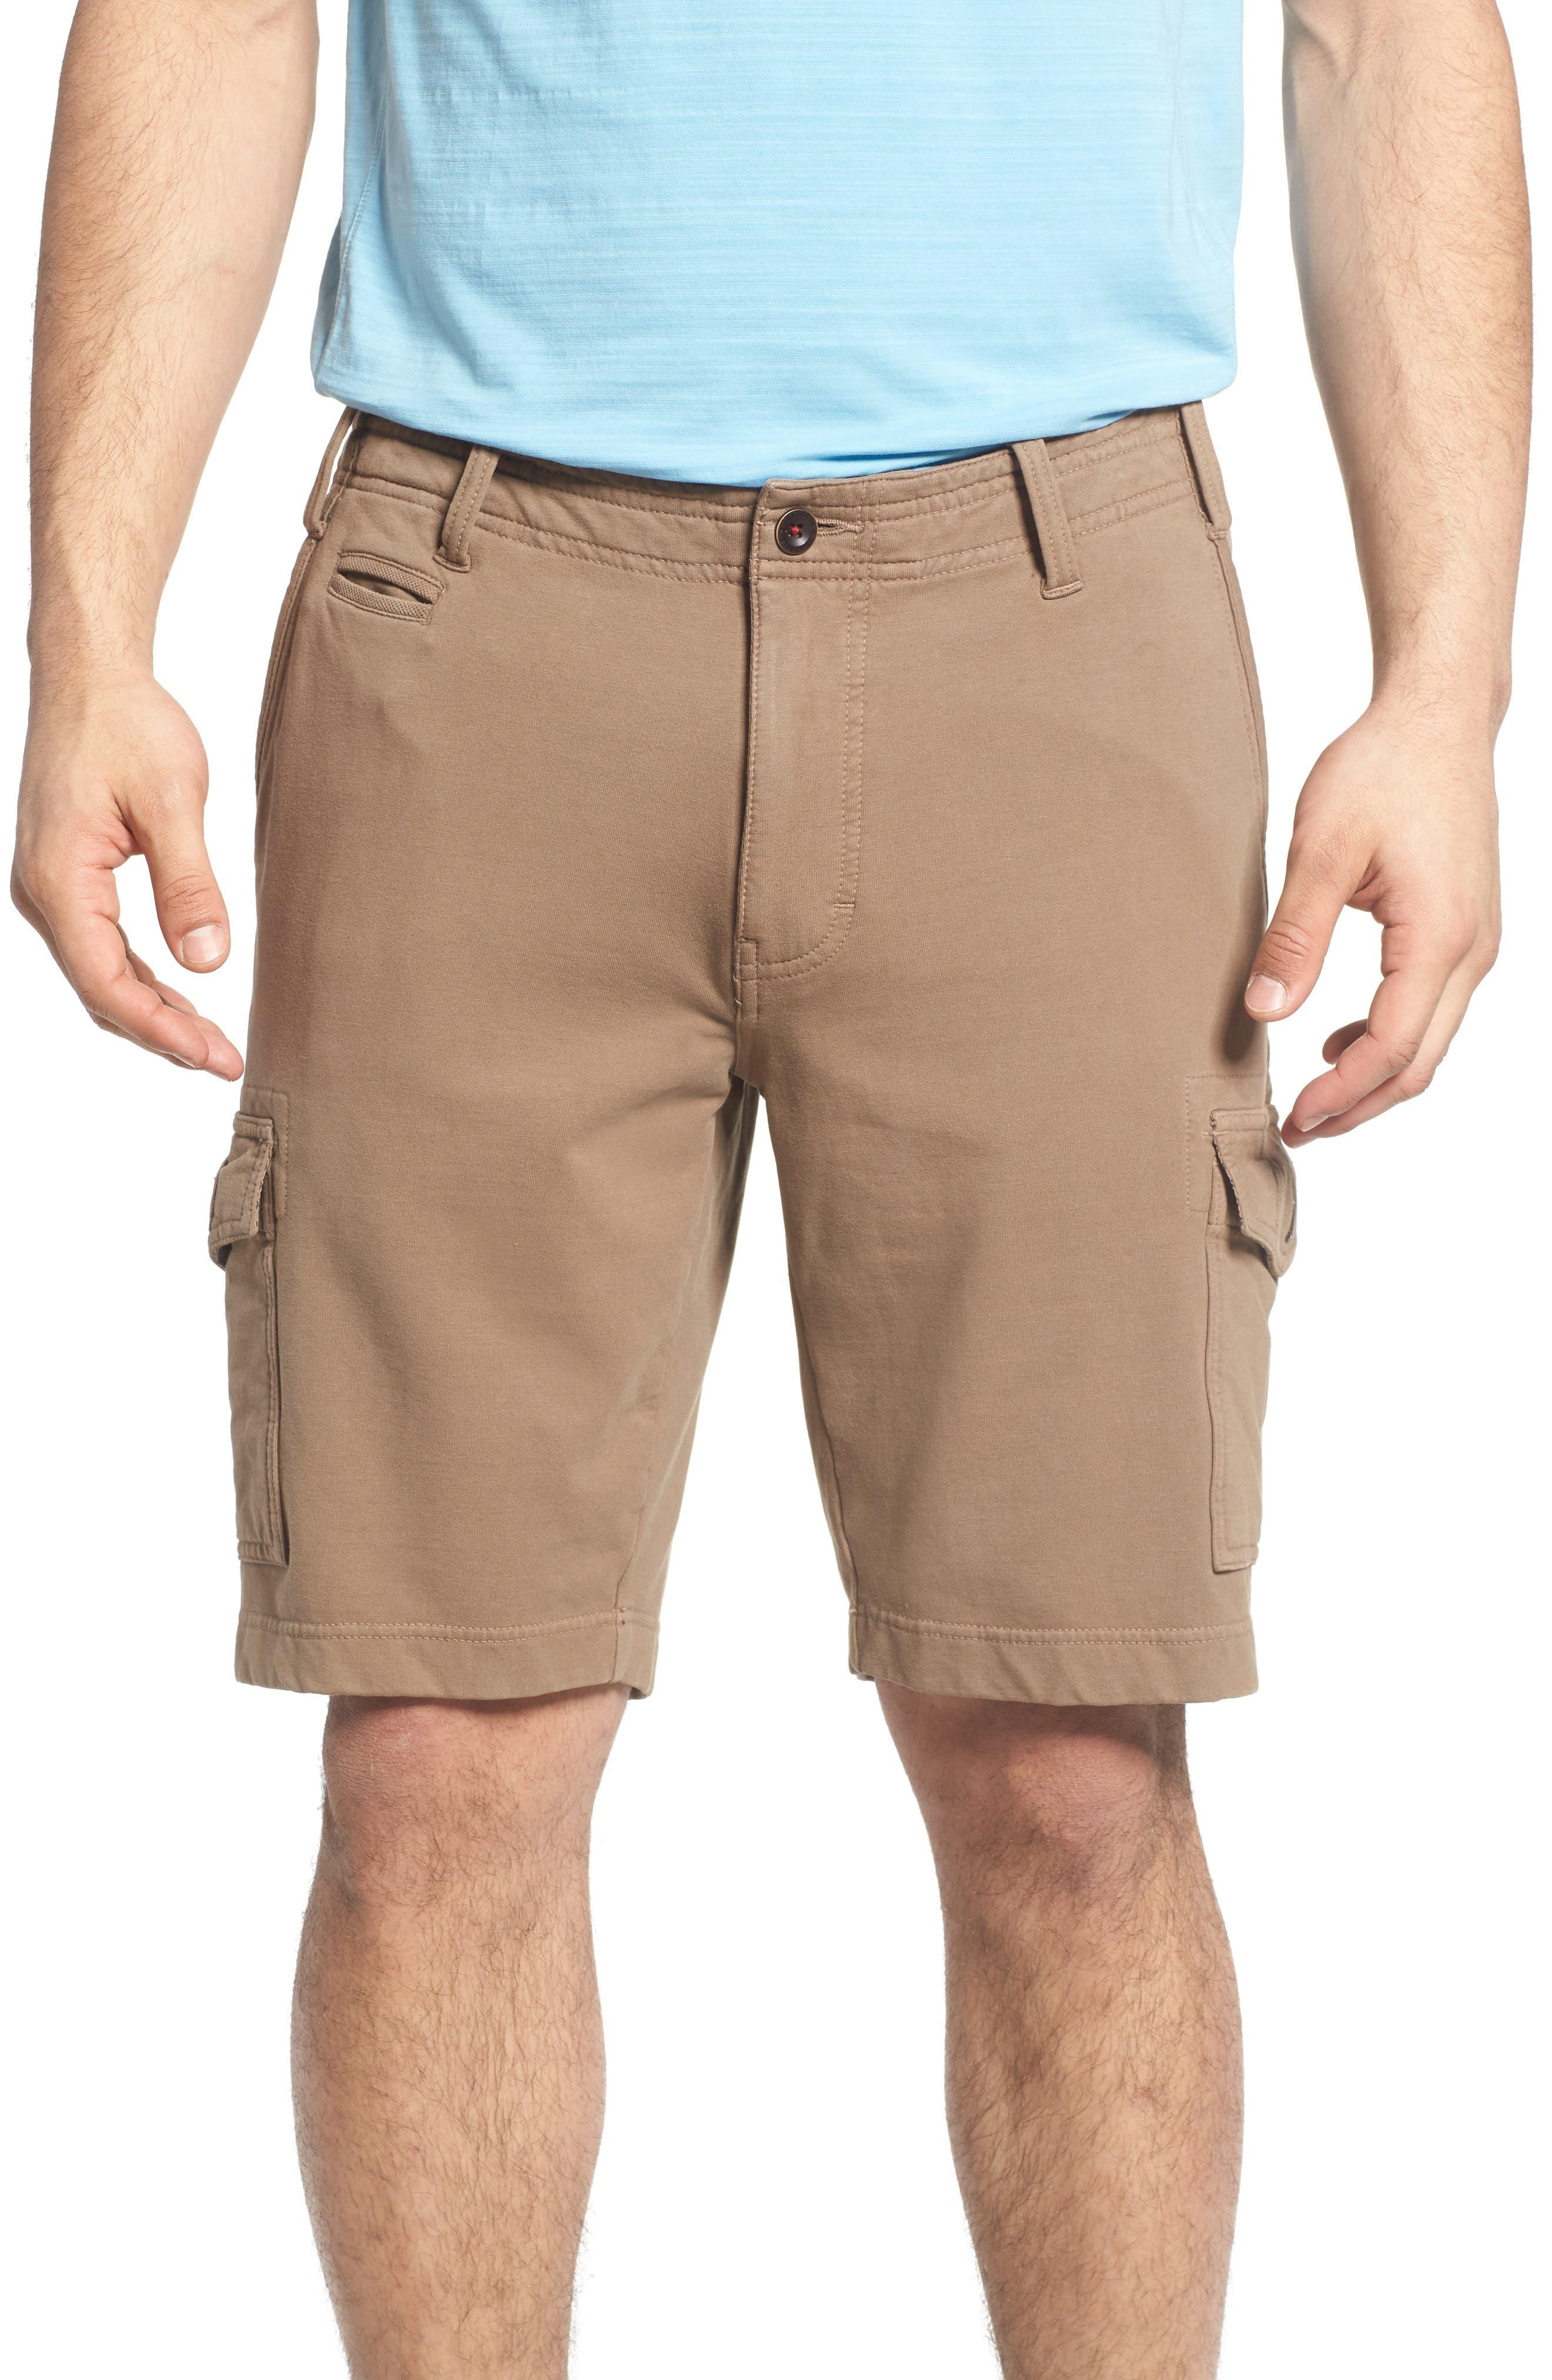 Carlton Knit Cargo Shorts,                         Main,                         color, 249